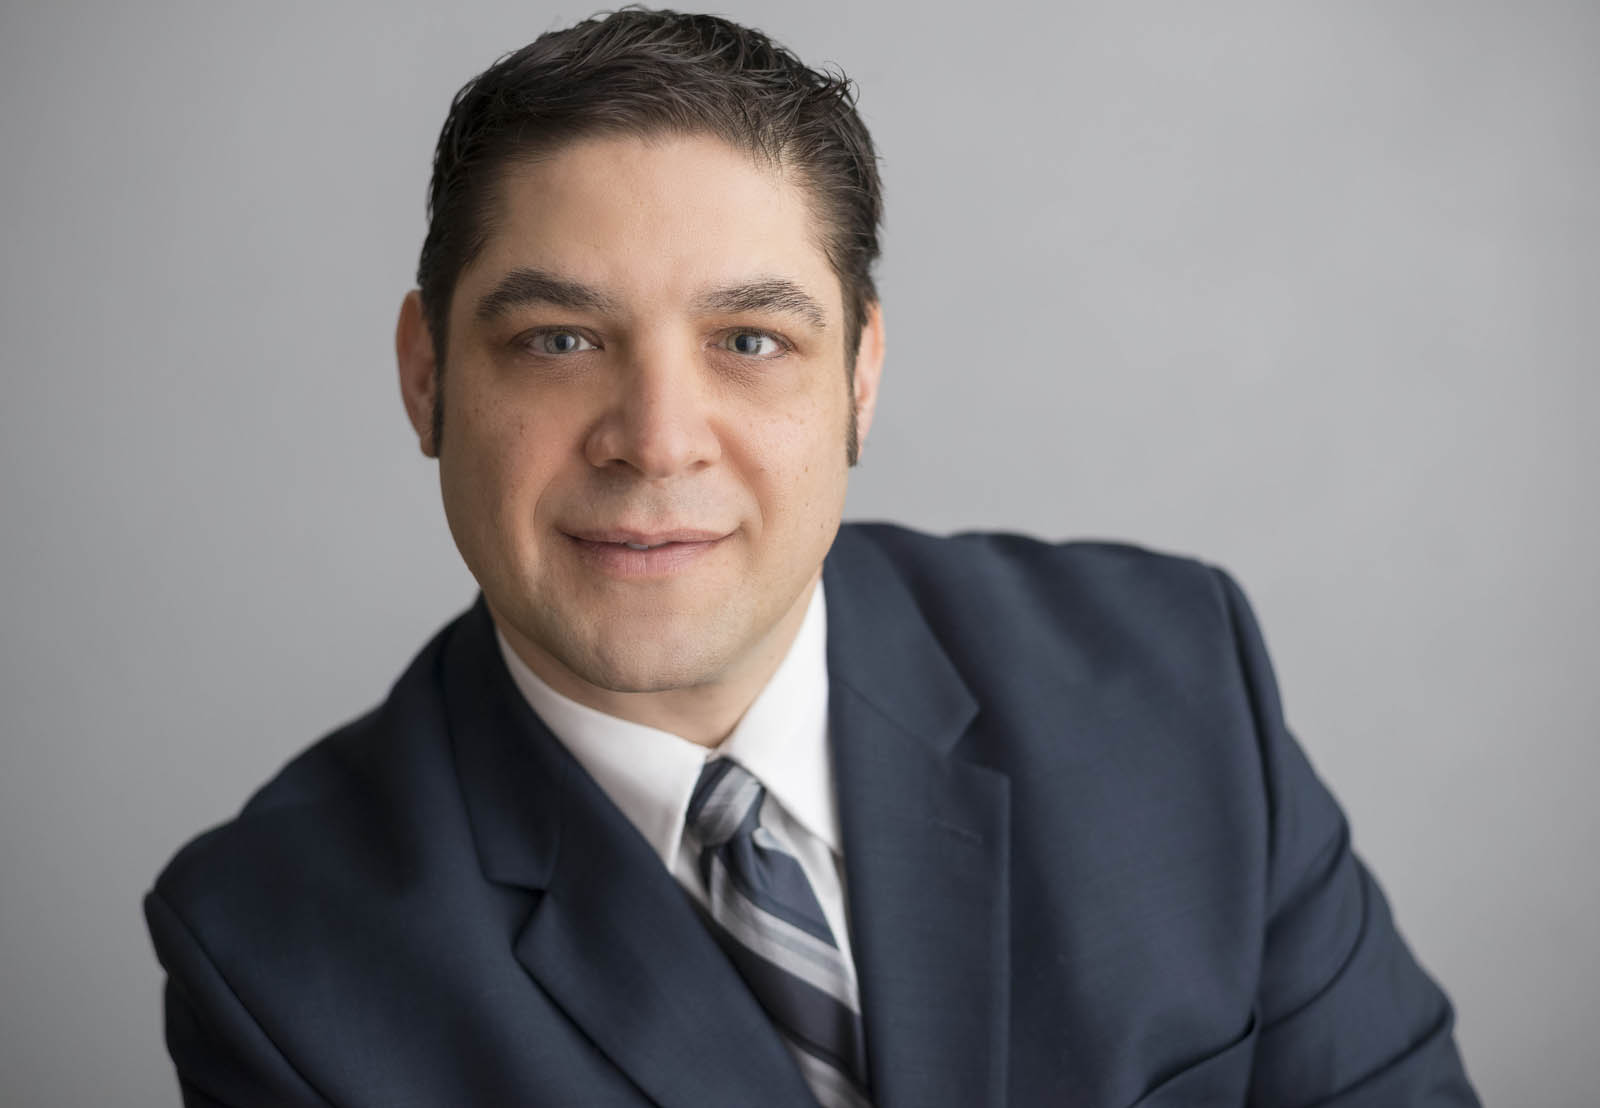 Michael Calogero, Chief Financial Officer